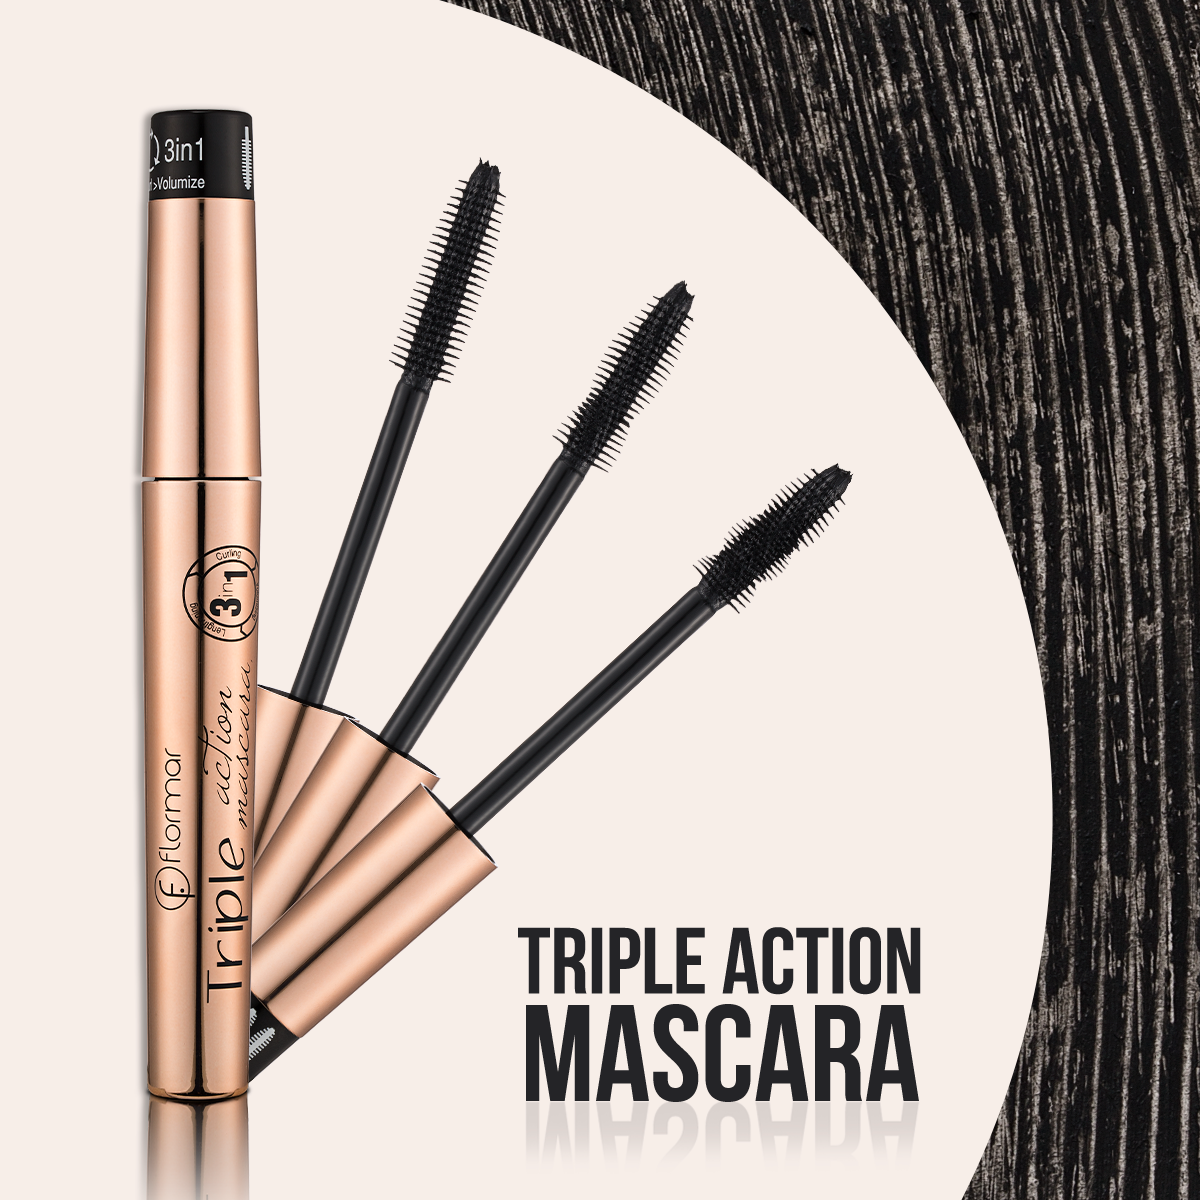 ماسكرا فلورمار تريبل أكشن Flormar Triple Action Mascara